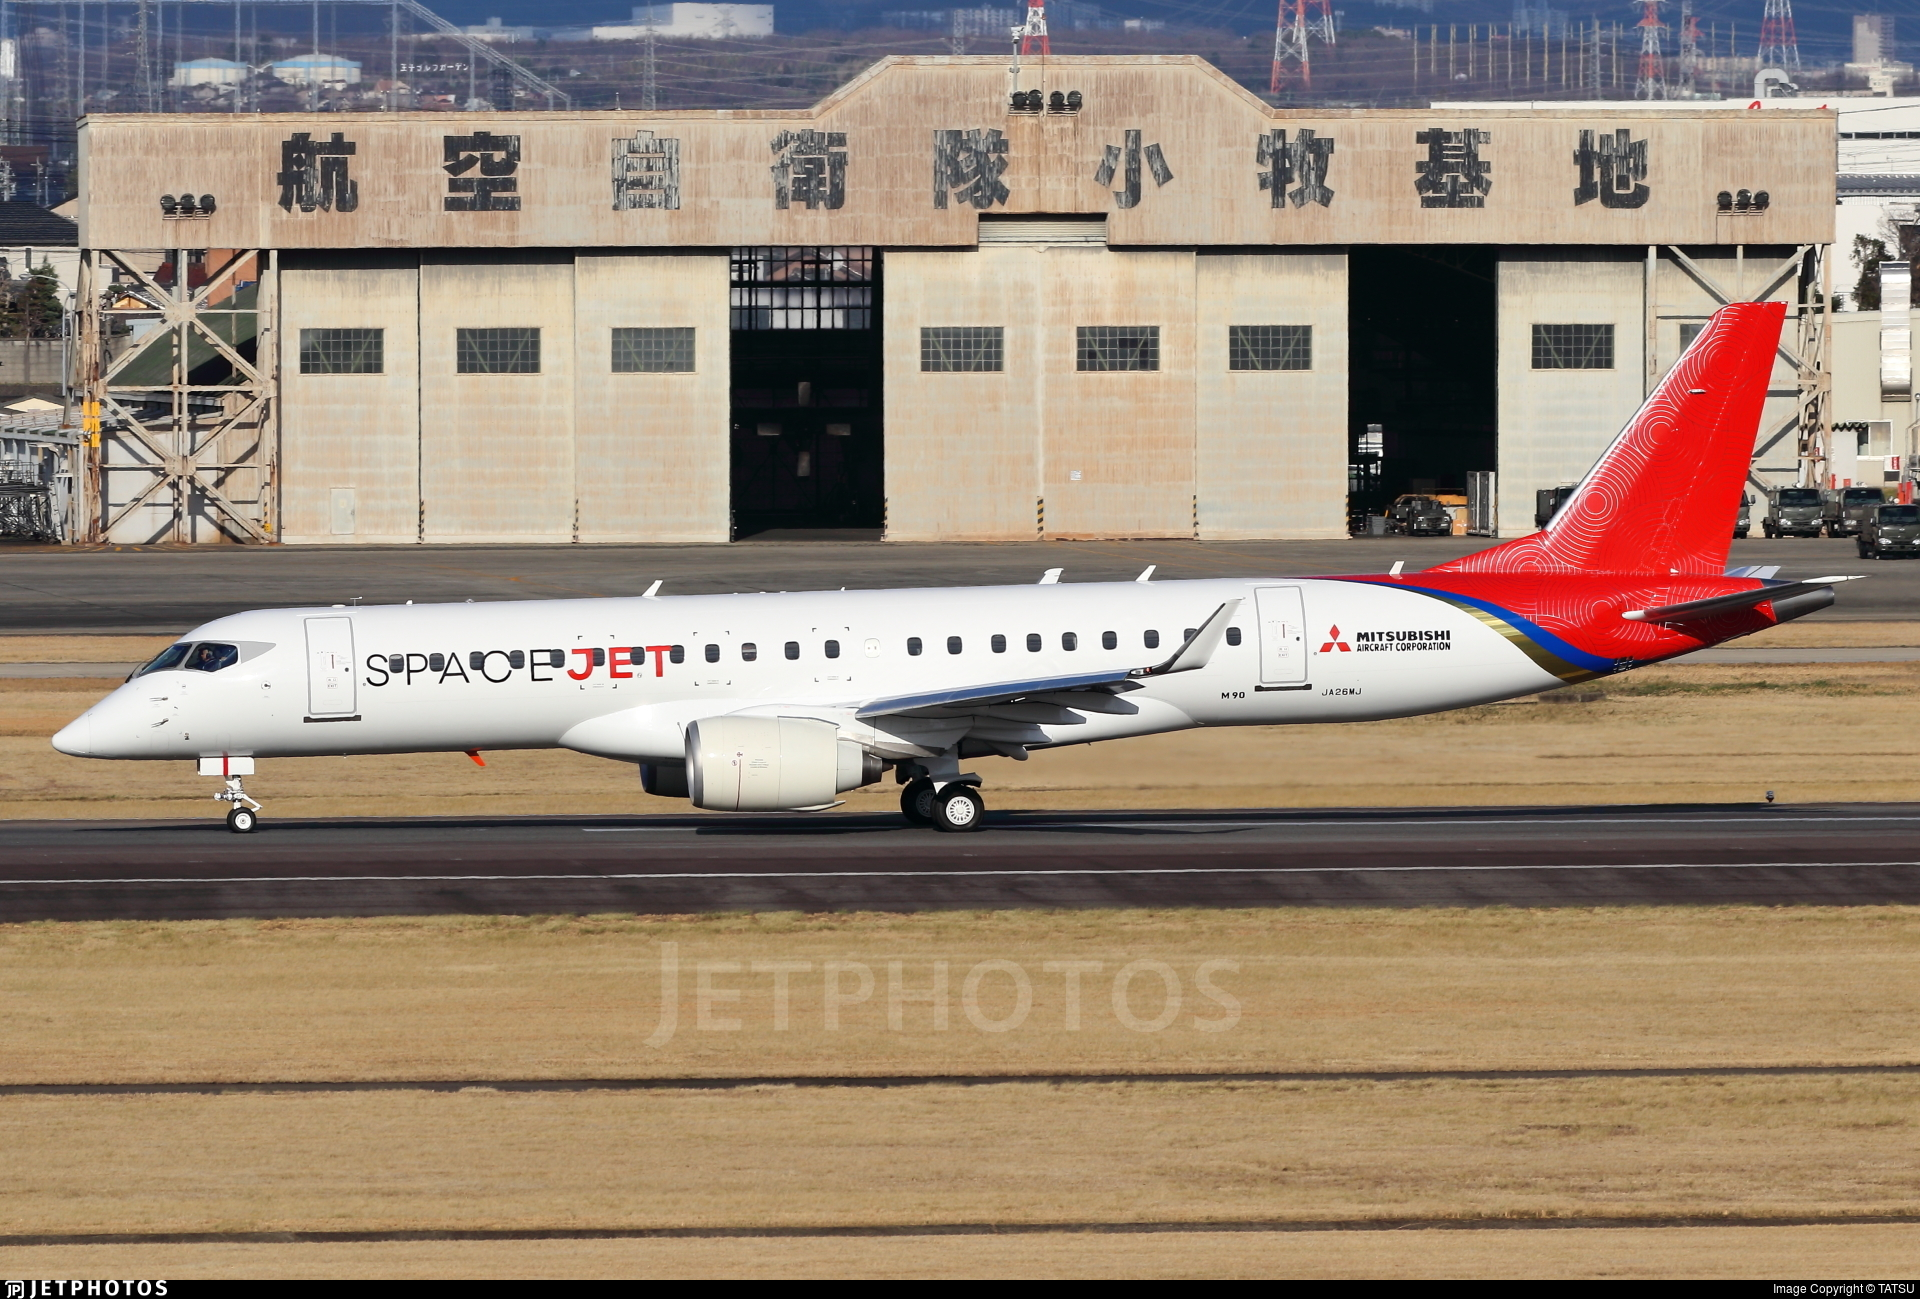 JA26MJ - Mitsubishi M90 SpaceJet - Mitsubishi Aircraft Corporation